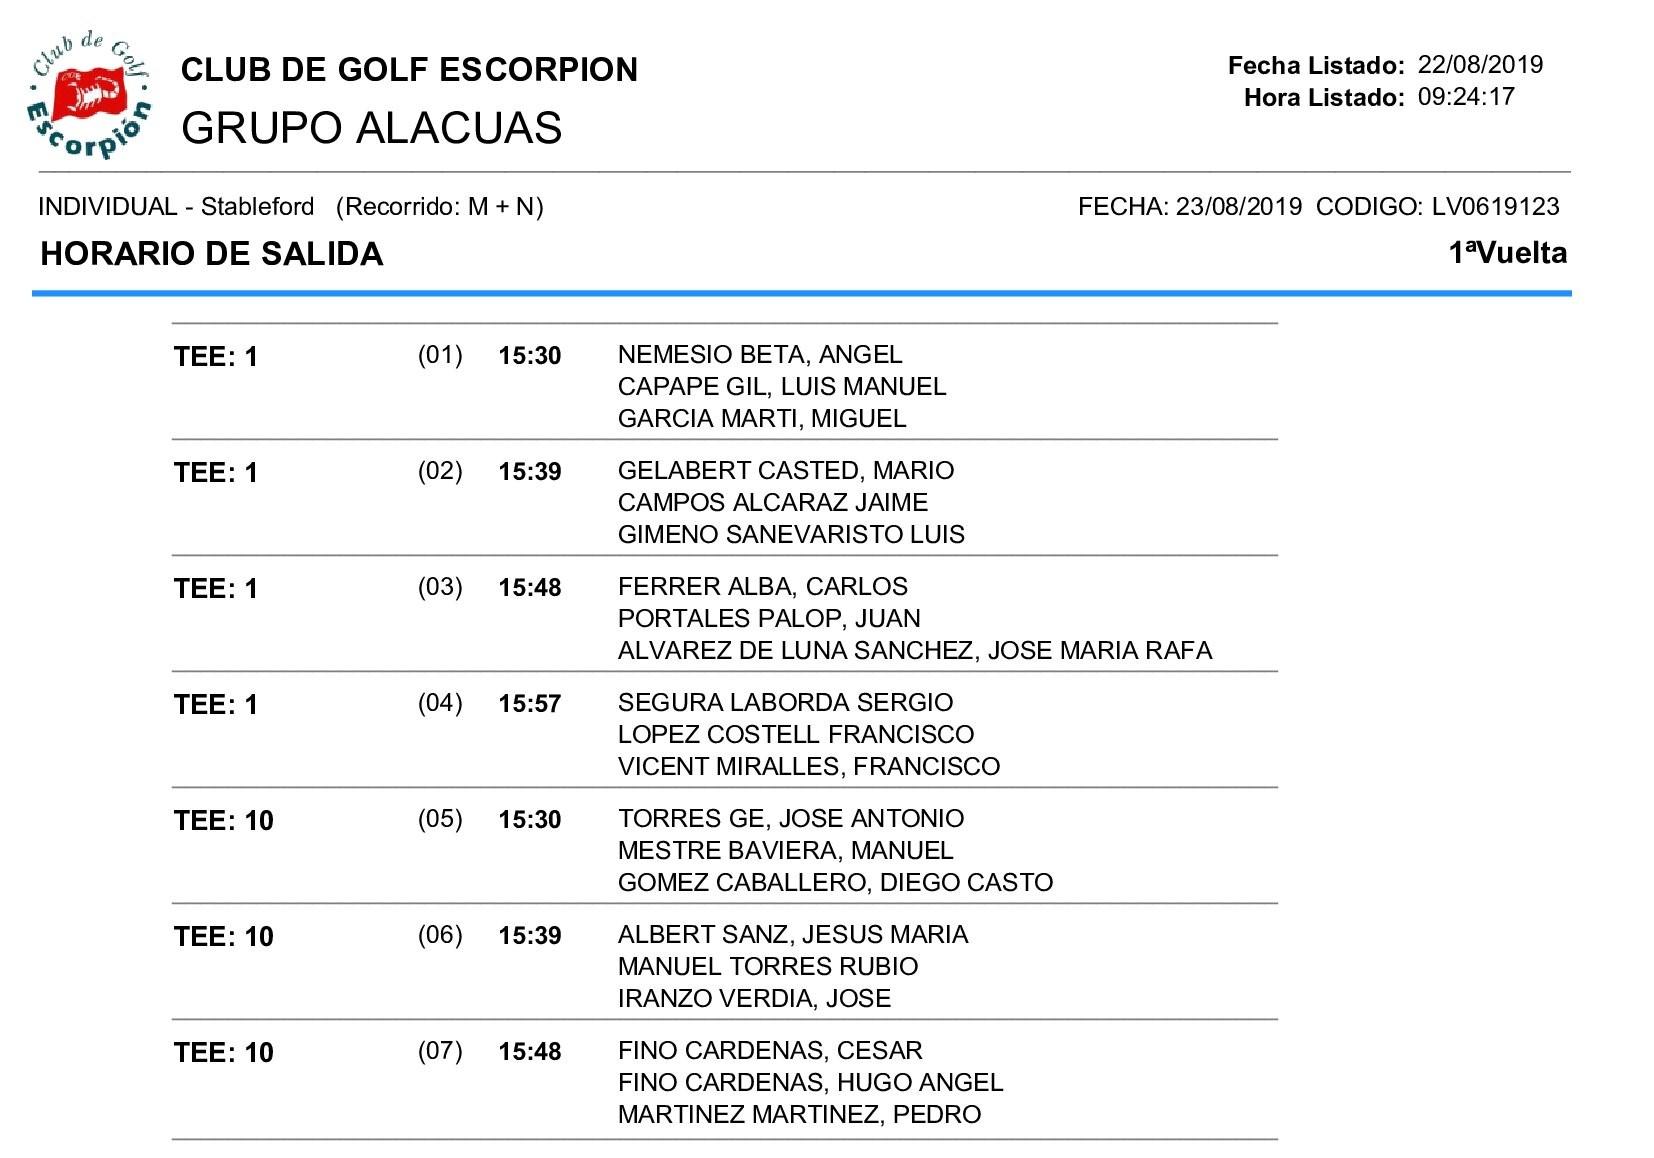 HORARIOS DE SALIDA 23-08-19